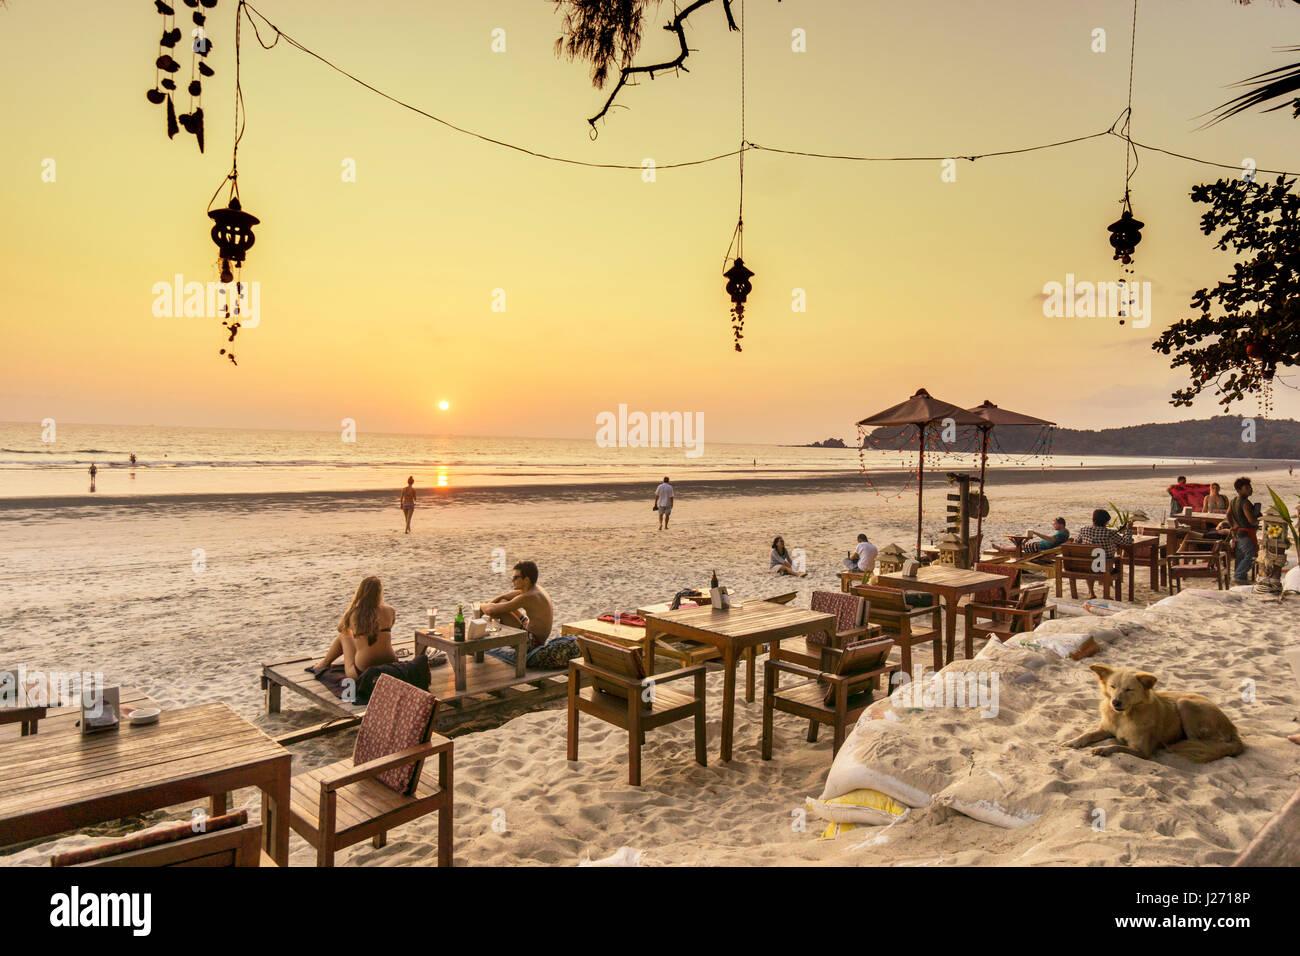 J.j. Seafood Restaurant, Long Beach, Ao Yai, Sonnenuntergang, Koh Phayam, Thailand Stockbild